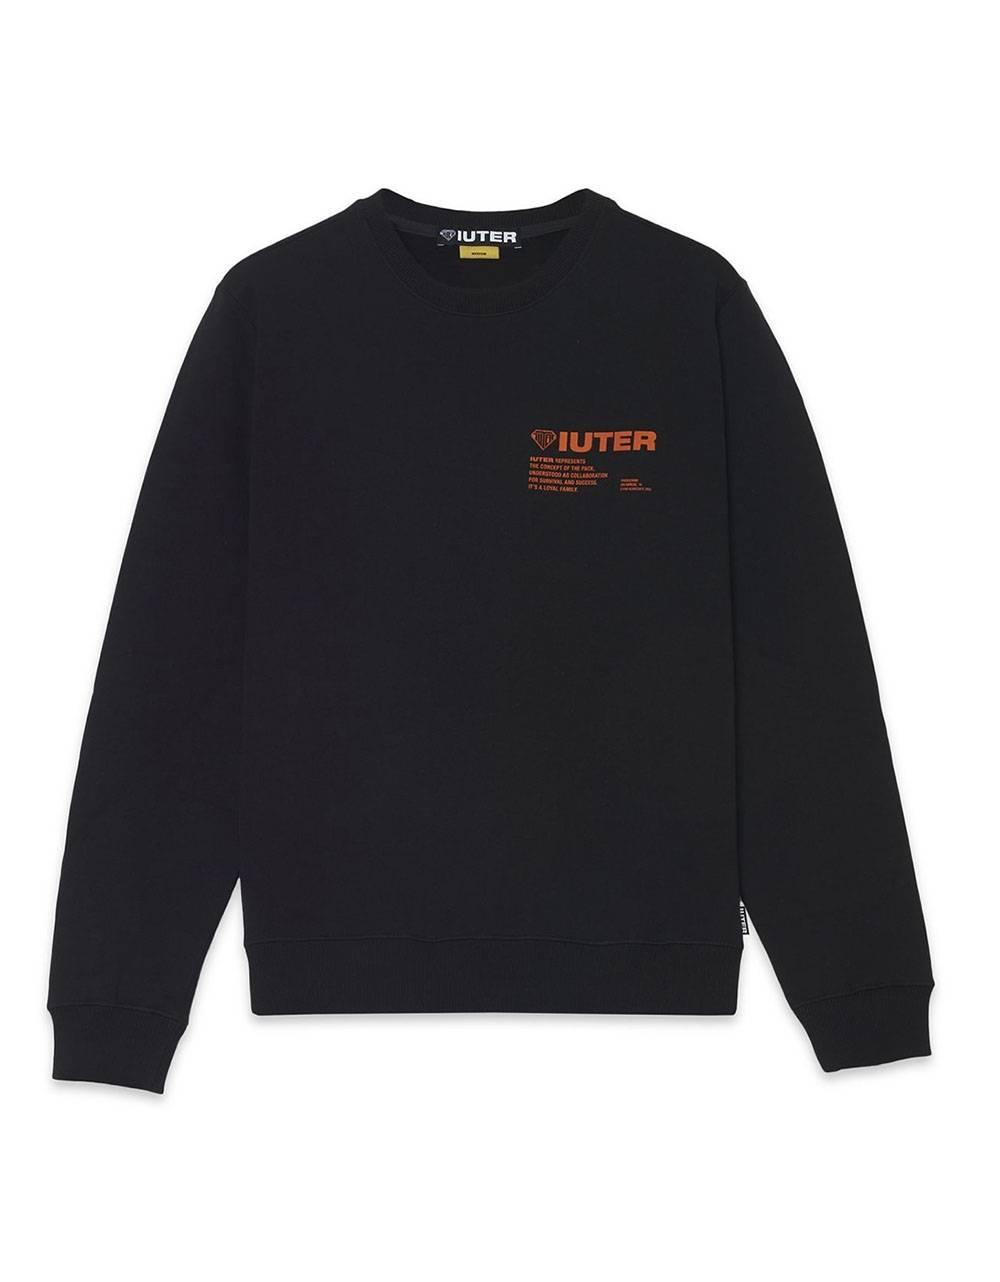 Iuter Info crewneck sweater - Black IUTER Sweater 85,00€